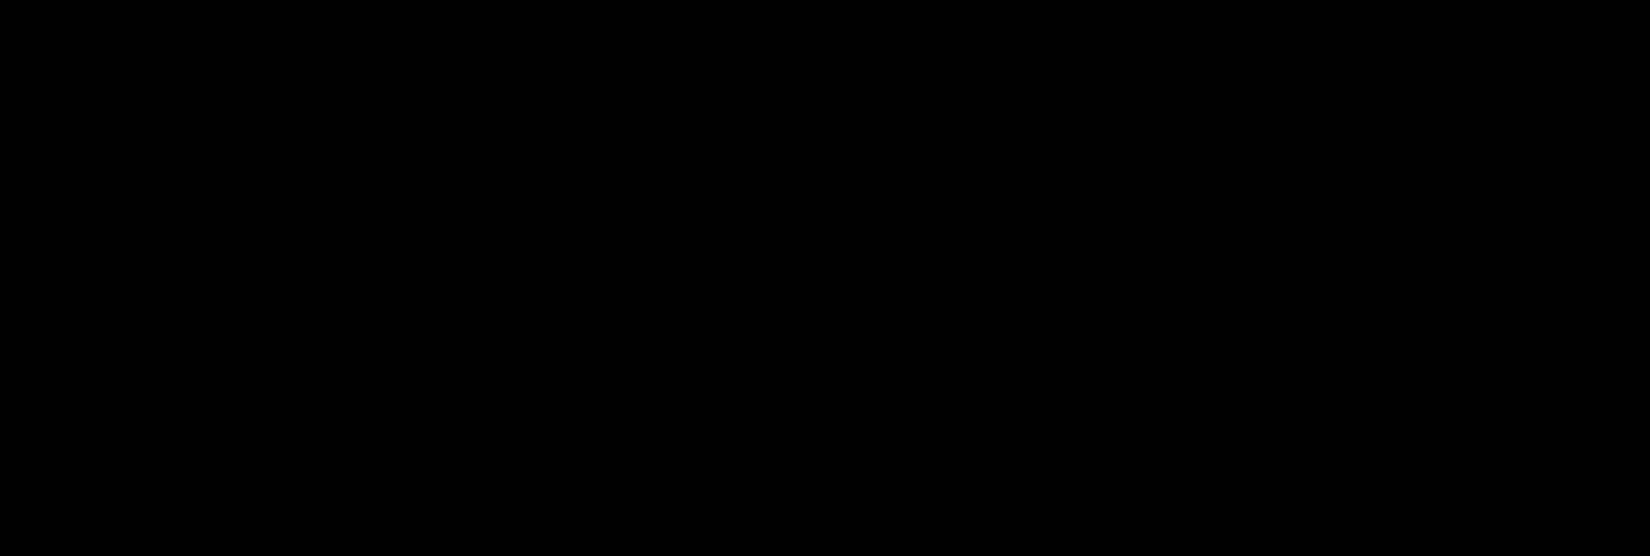 1krewella-2015-logo-font-forum-dafontcom-132111.png